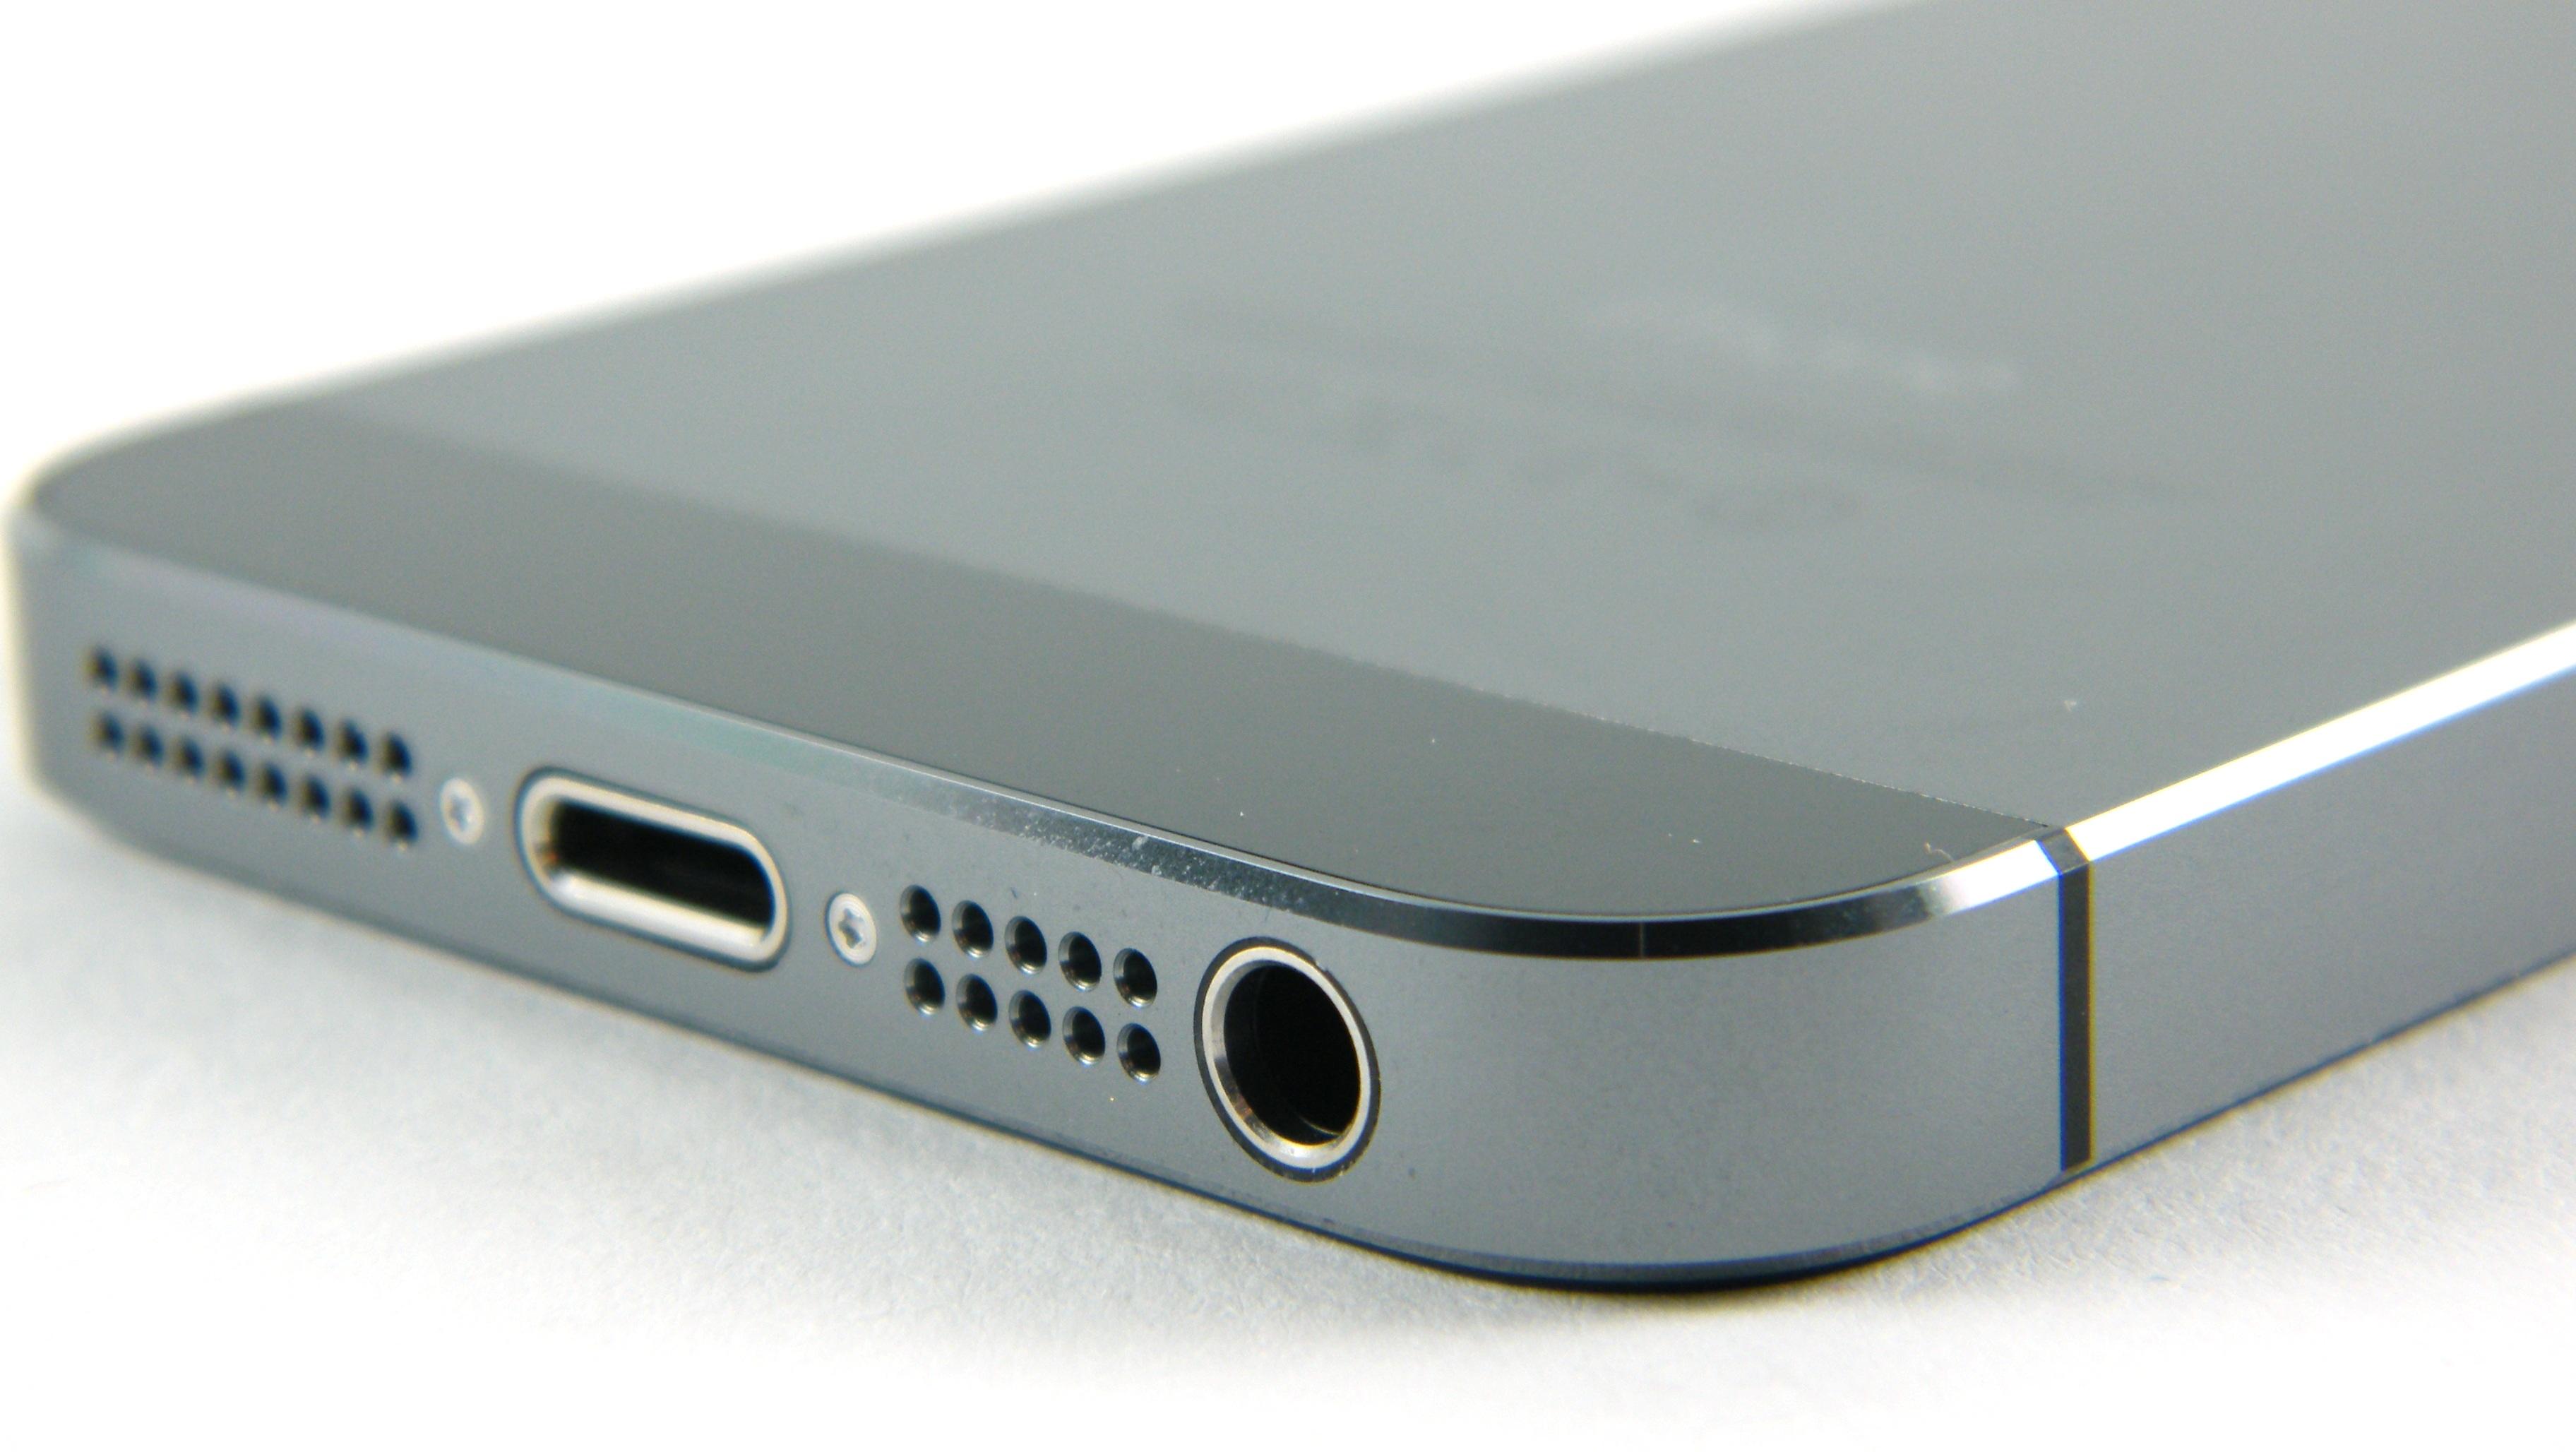 iPhones 5S review